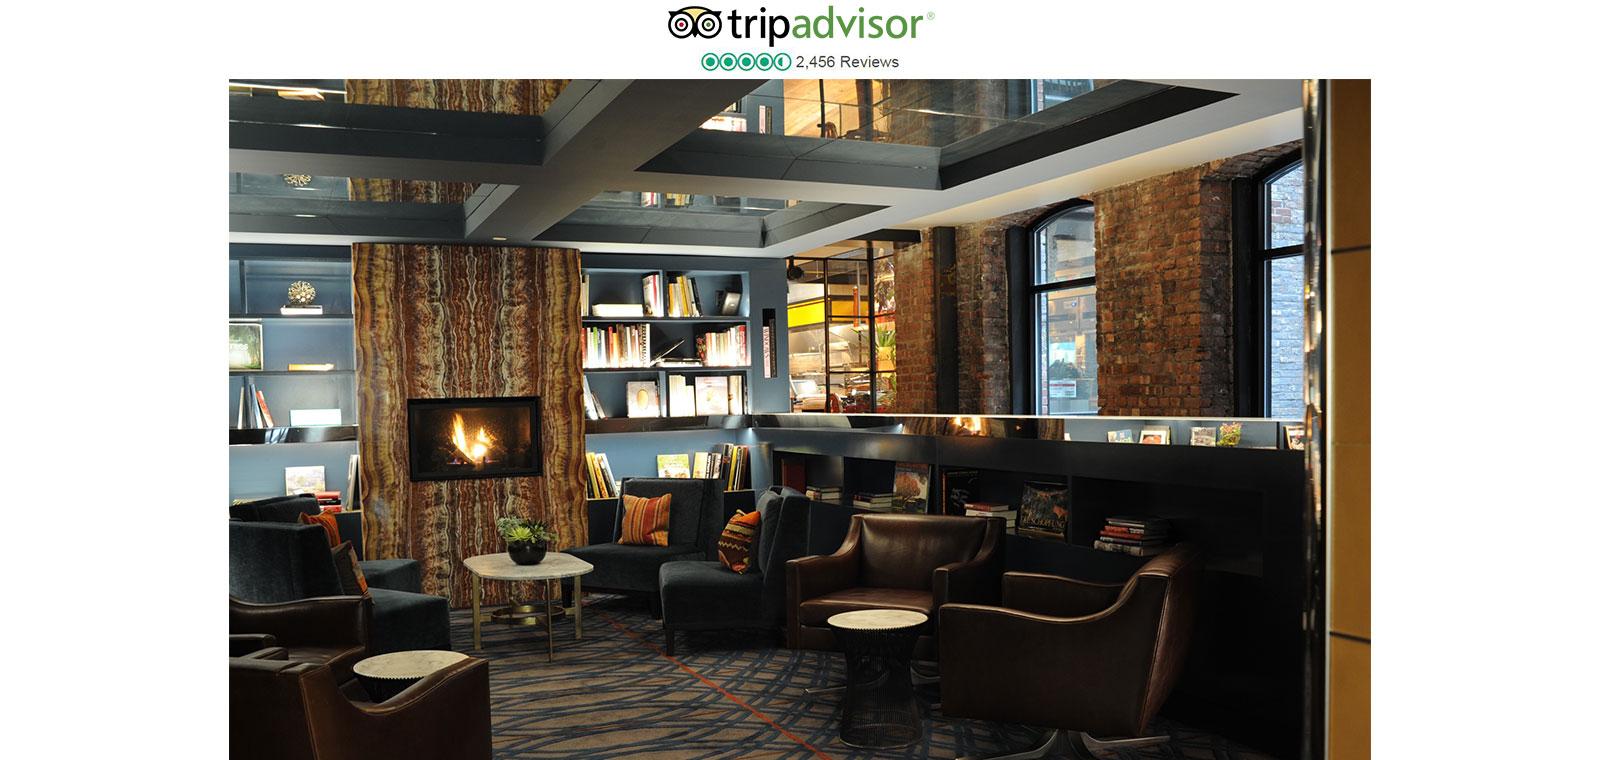 TripAdvisor Logo And Park South Lobby With Fireplace